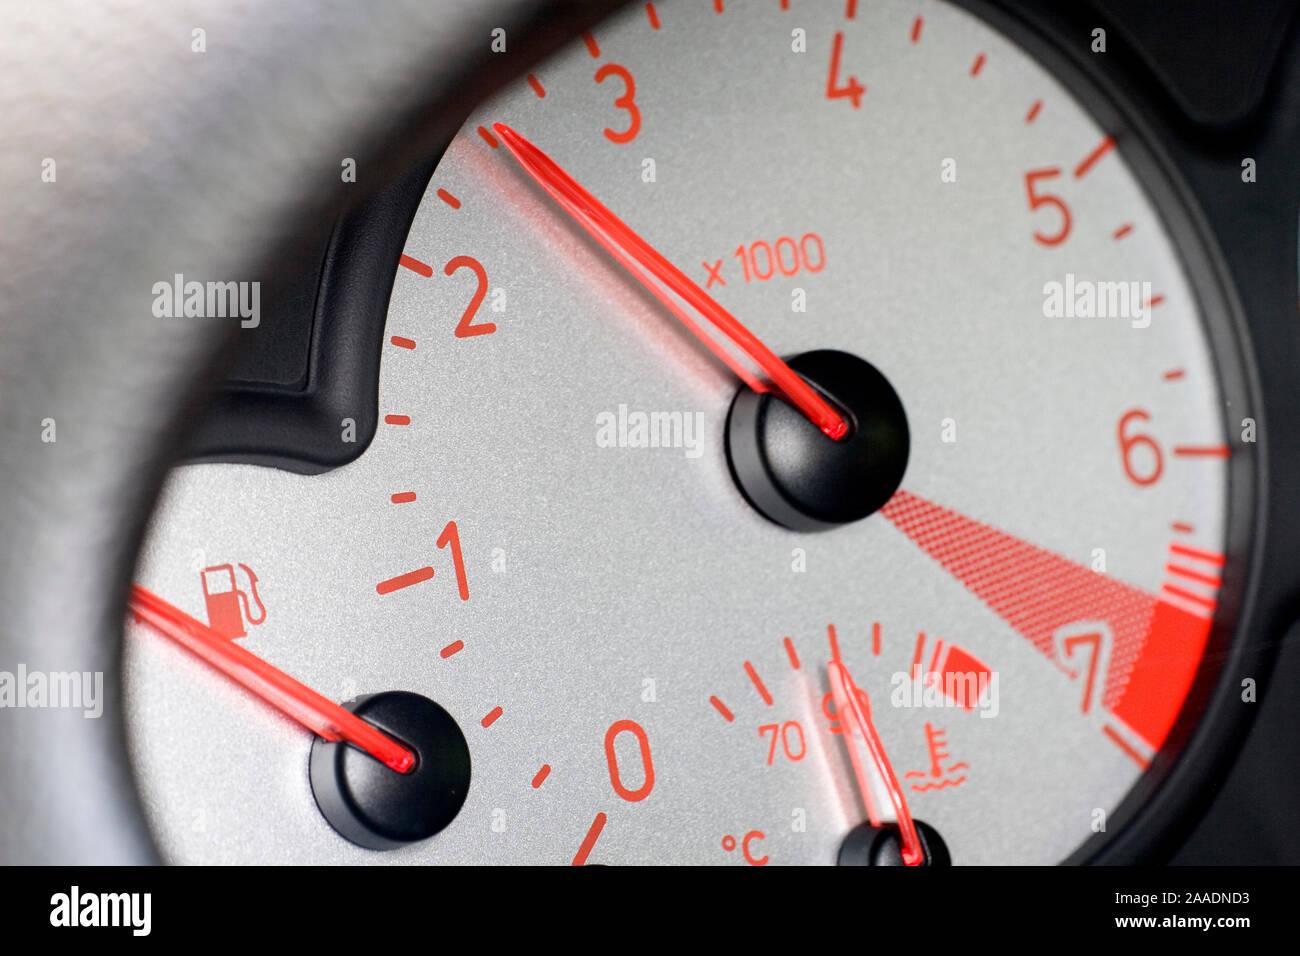 Armaturenbrett eines Peugeot 206 CC (no pr) Stock Photo